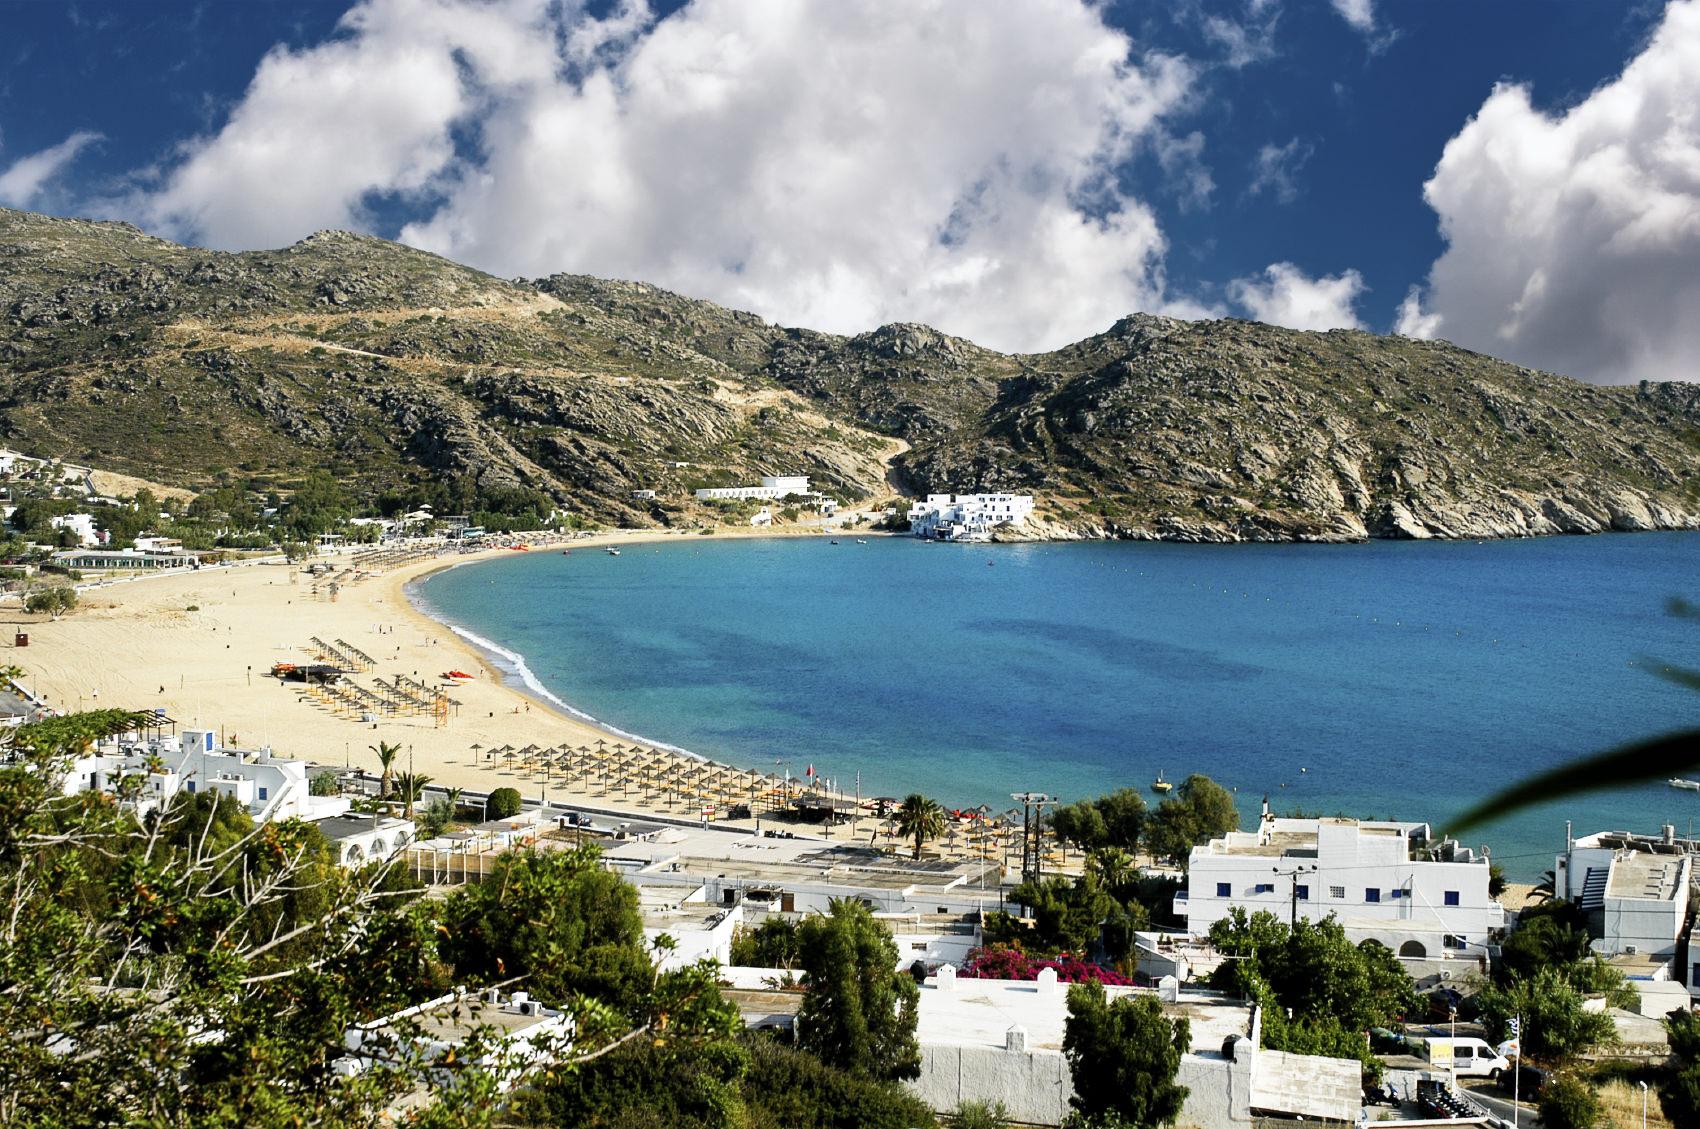 View of Mylopotas beach, Ios island, Cyclades, Greece